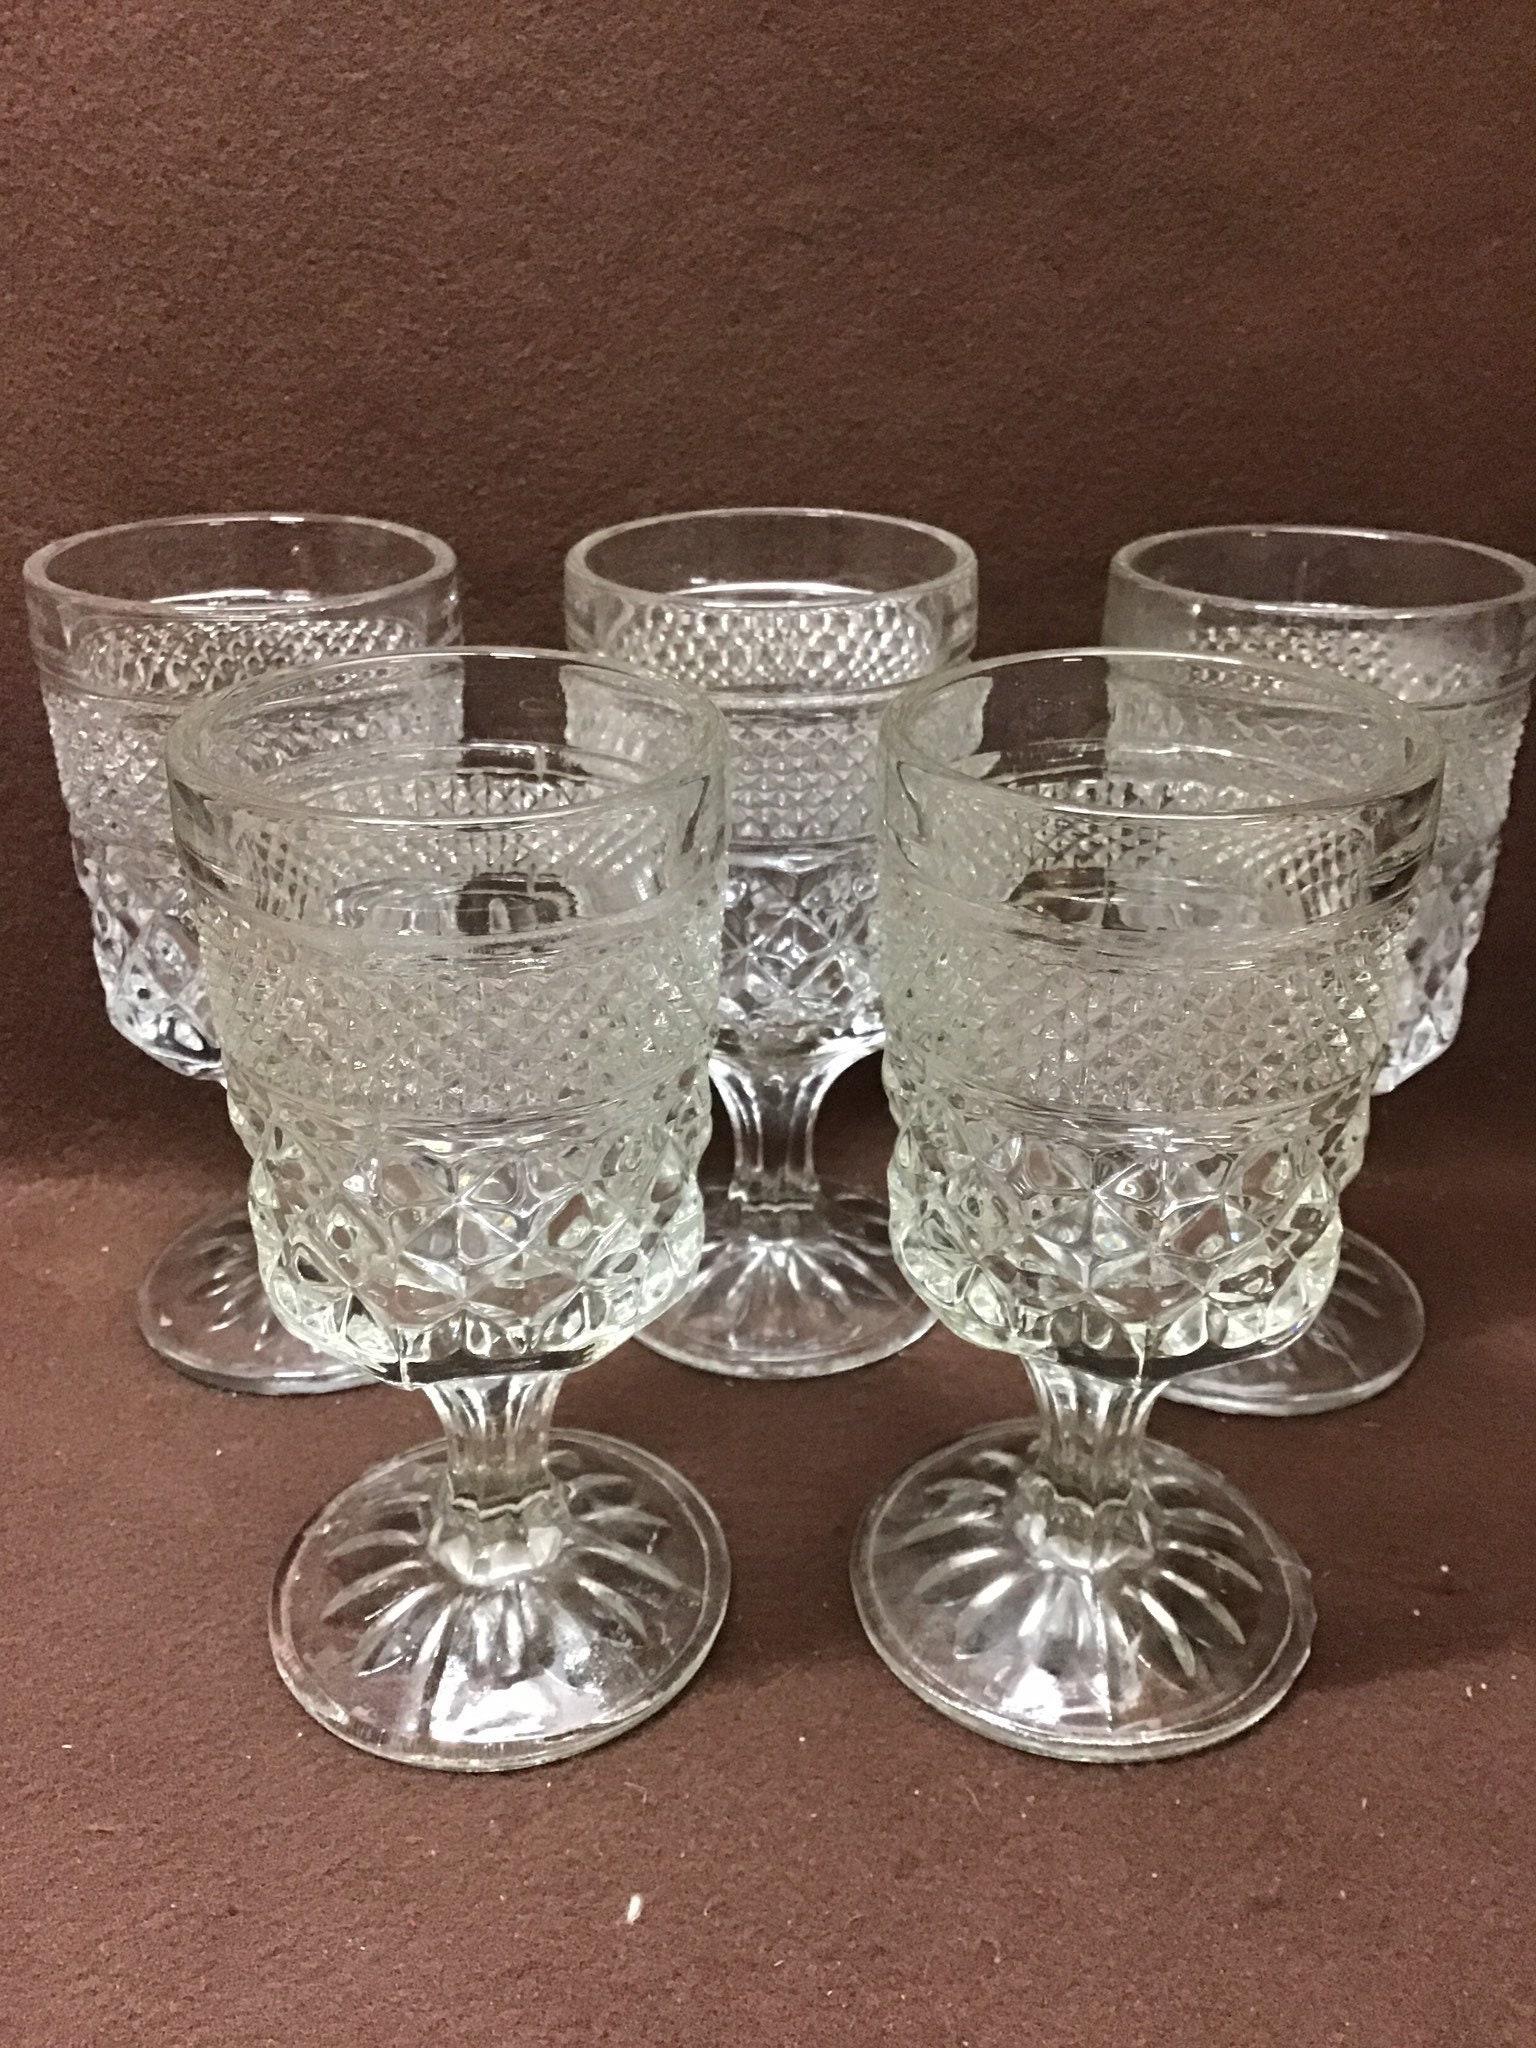 Wedding Decor Anchor Hocking Wexford Goblets Set of 2 Wexford Wine Glasses Pair of Vintage Wine Glasses